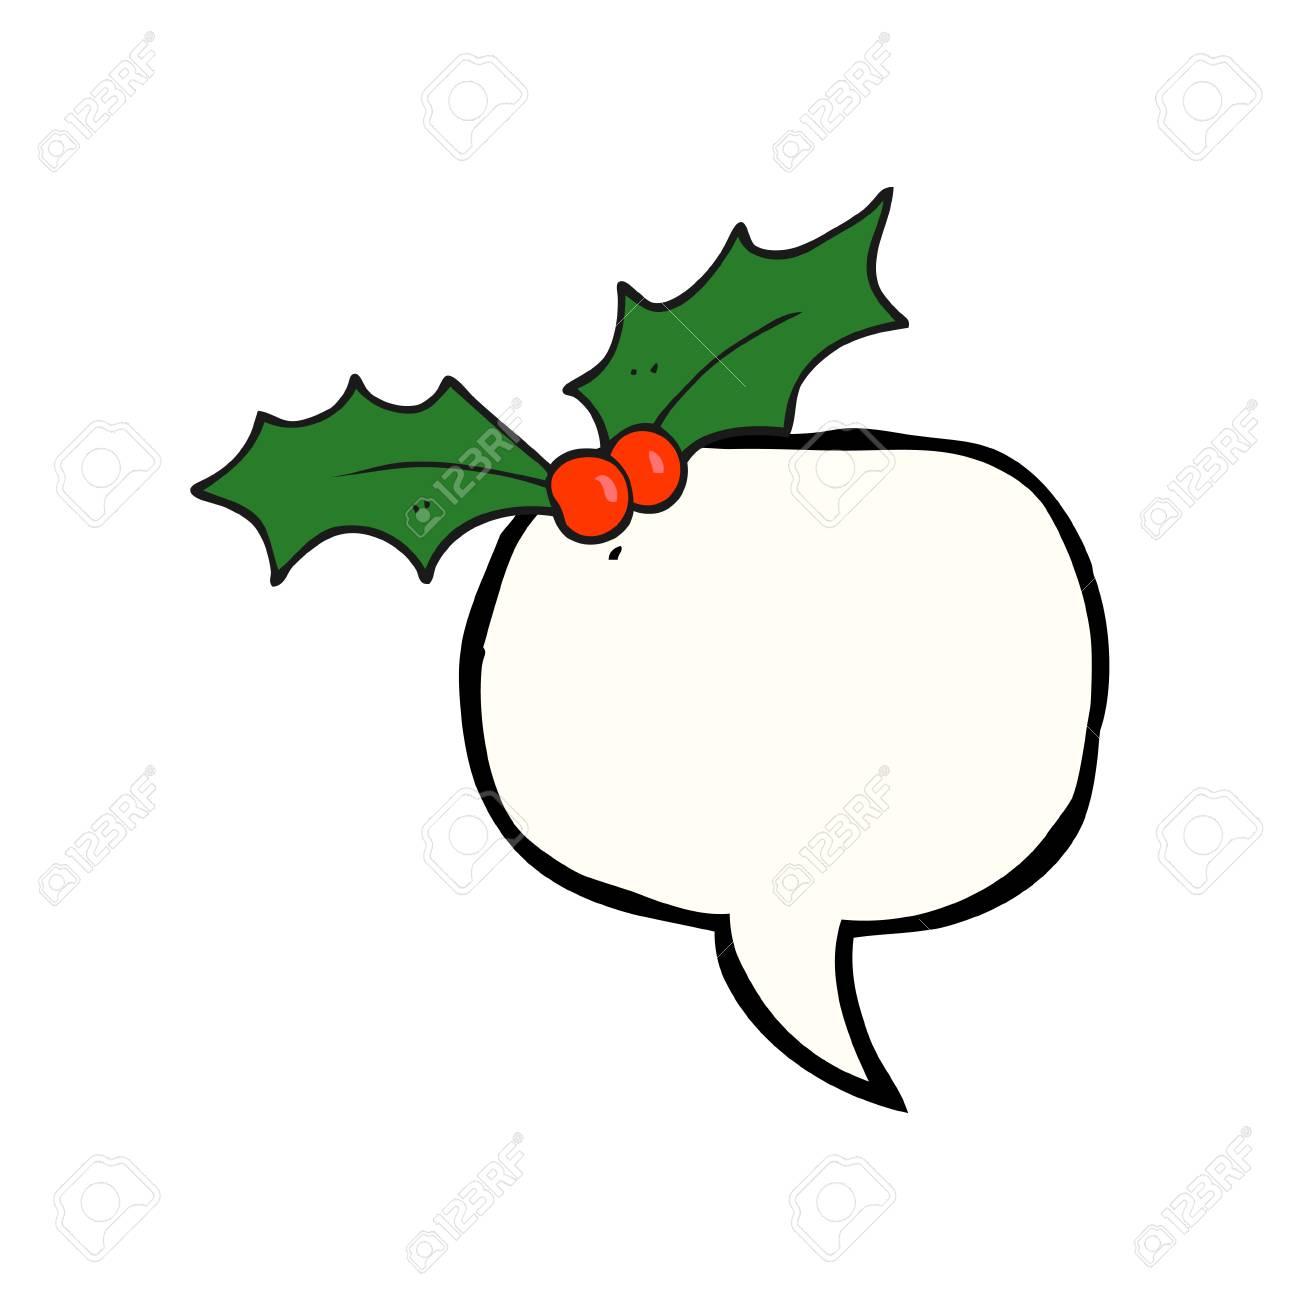 Christmas Holly Cartoon.Freehand Drawn Speech Bubble Cartoon Christmas Holly